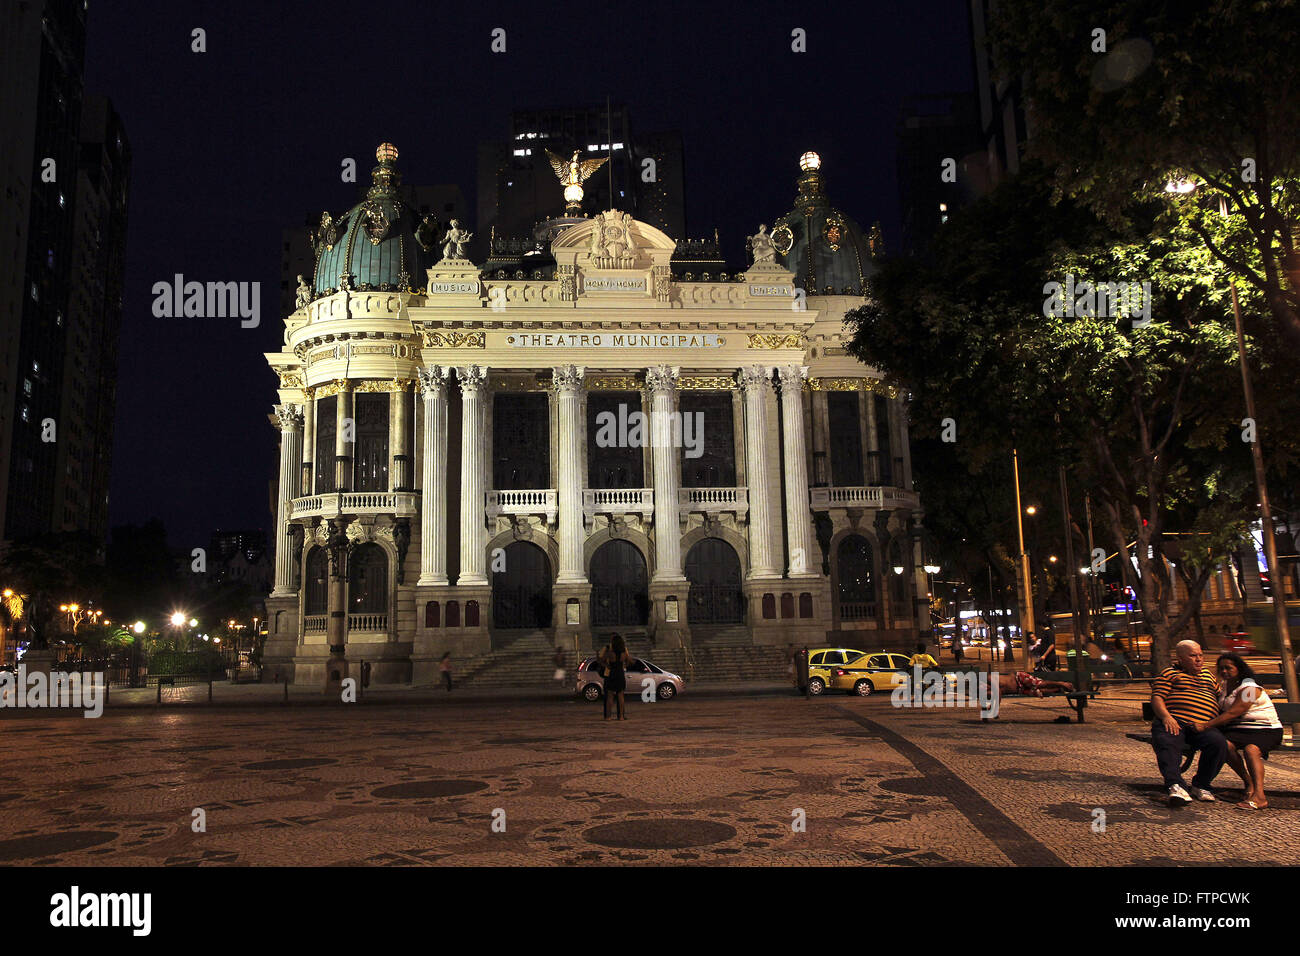 Municipal Theater of Rio de Janeiro at night - opened in 1909 - Stock Image